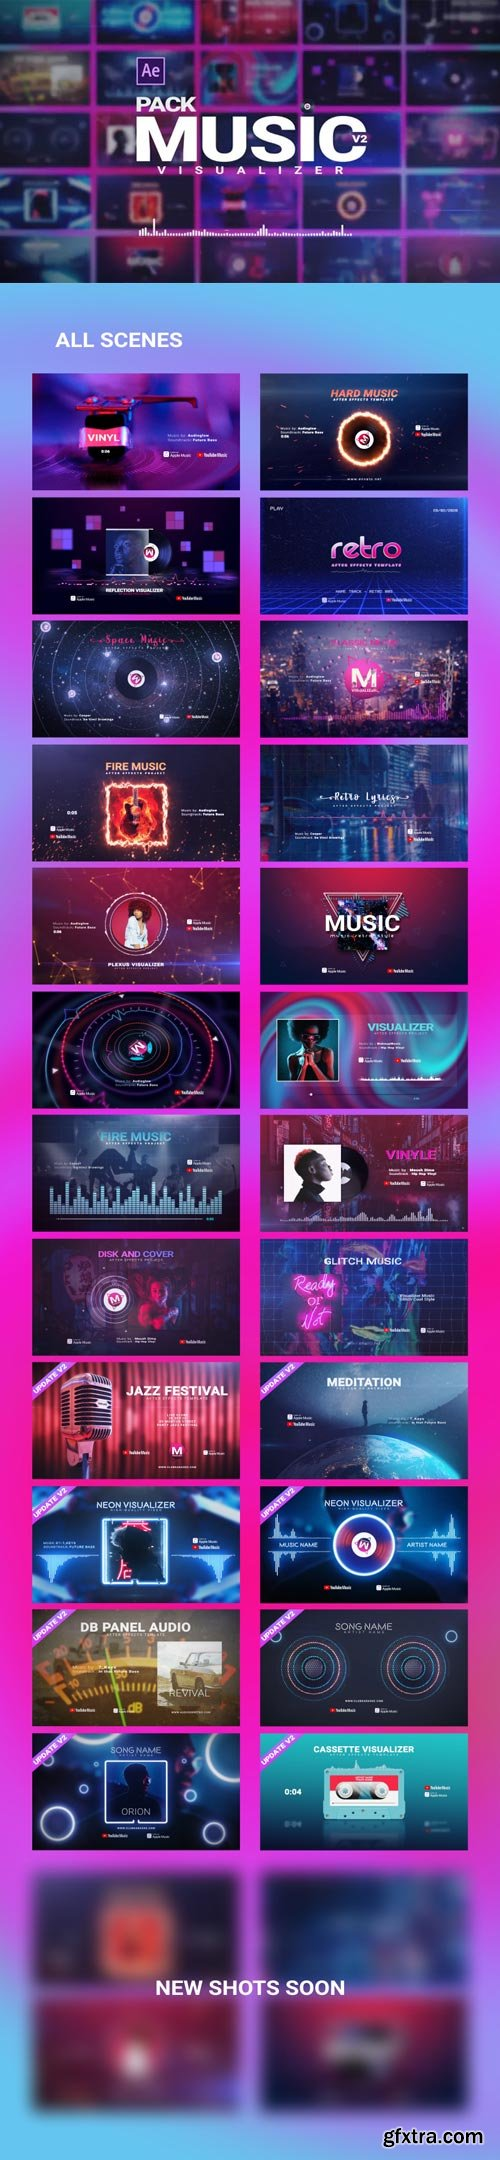 Videohive - Music Visualizer Pack V2 - 26261391